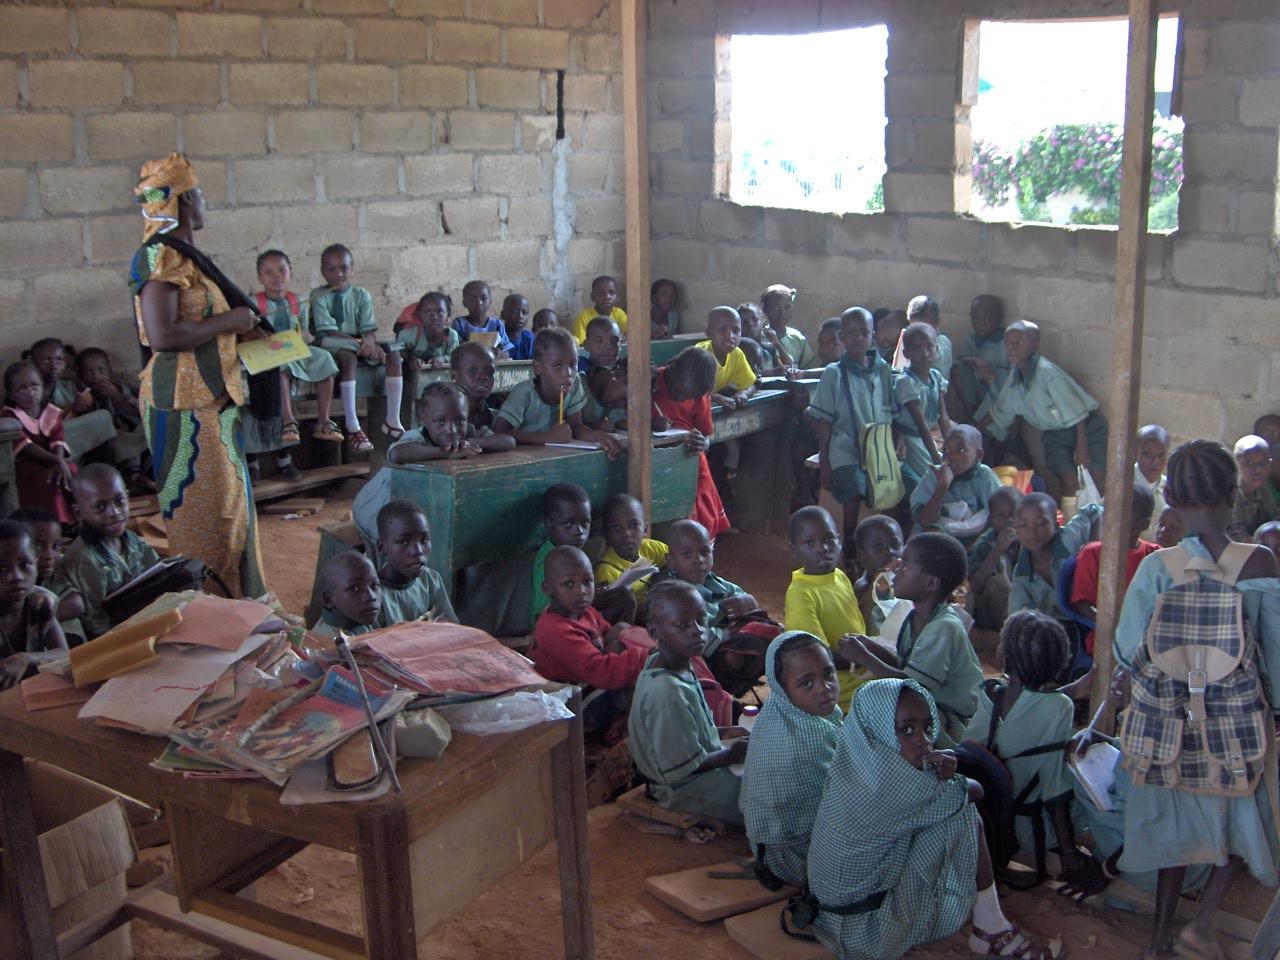 OLPC and Intel Classmate PC in Nigeria /static/Nigeria/hpim2121.jpg